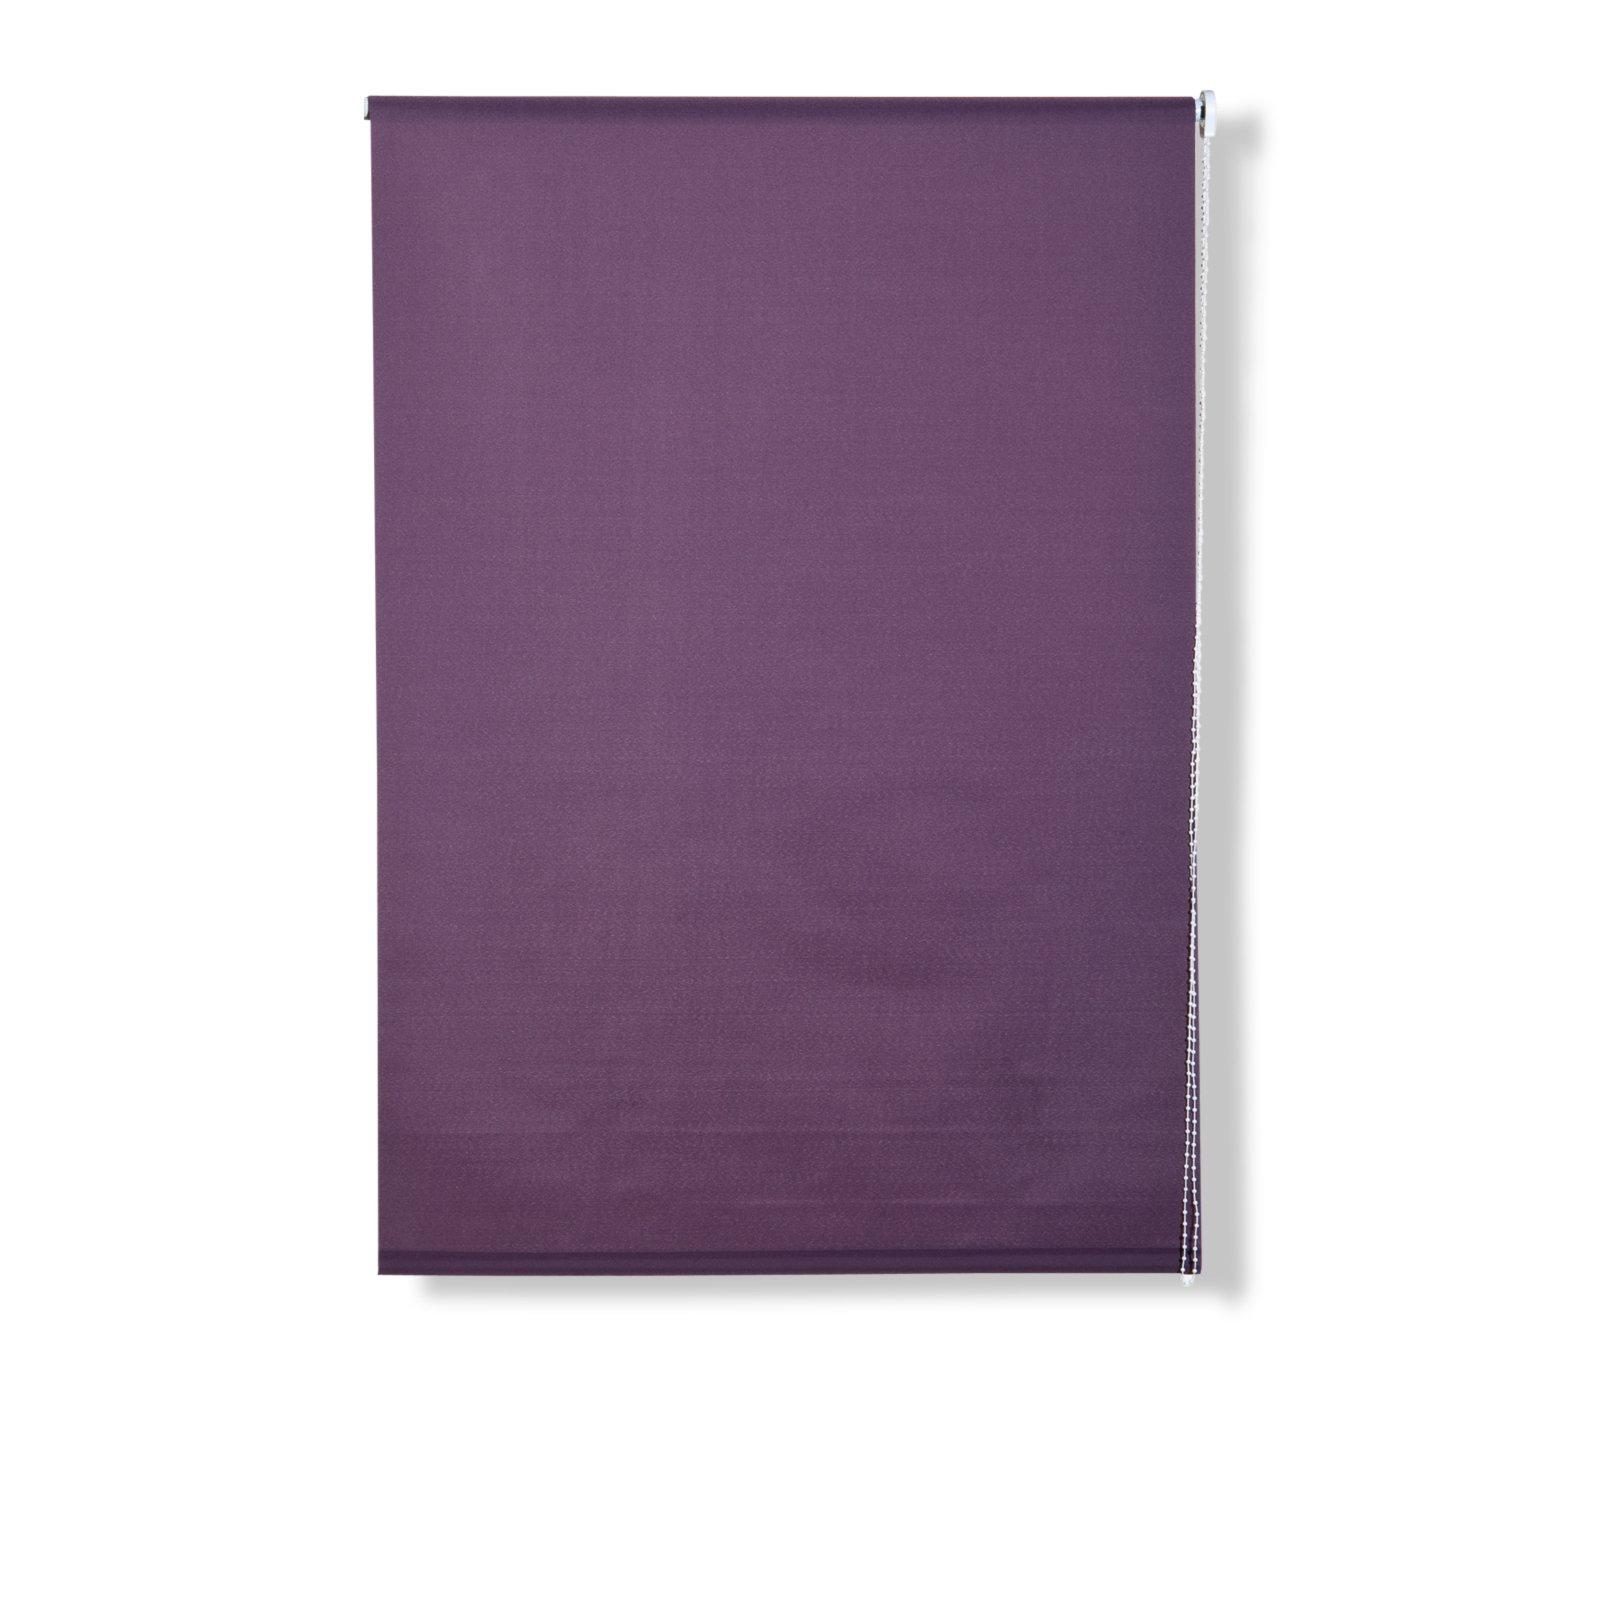 rollo aubergine 80x180 cm sichtschutzrollos rollos jalousien deko haushalt. Black Bedroom Furniture Sets. Home Design Ideas